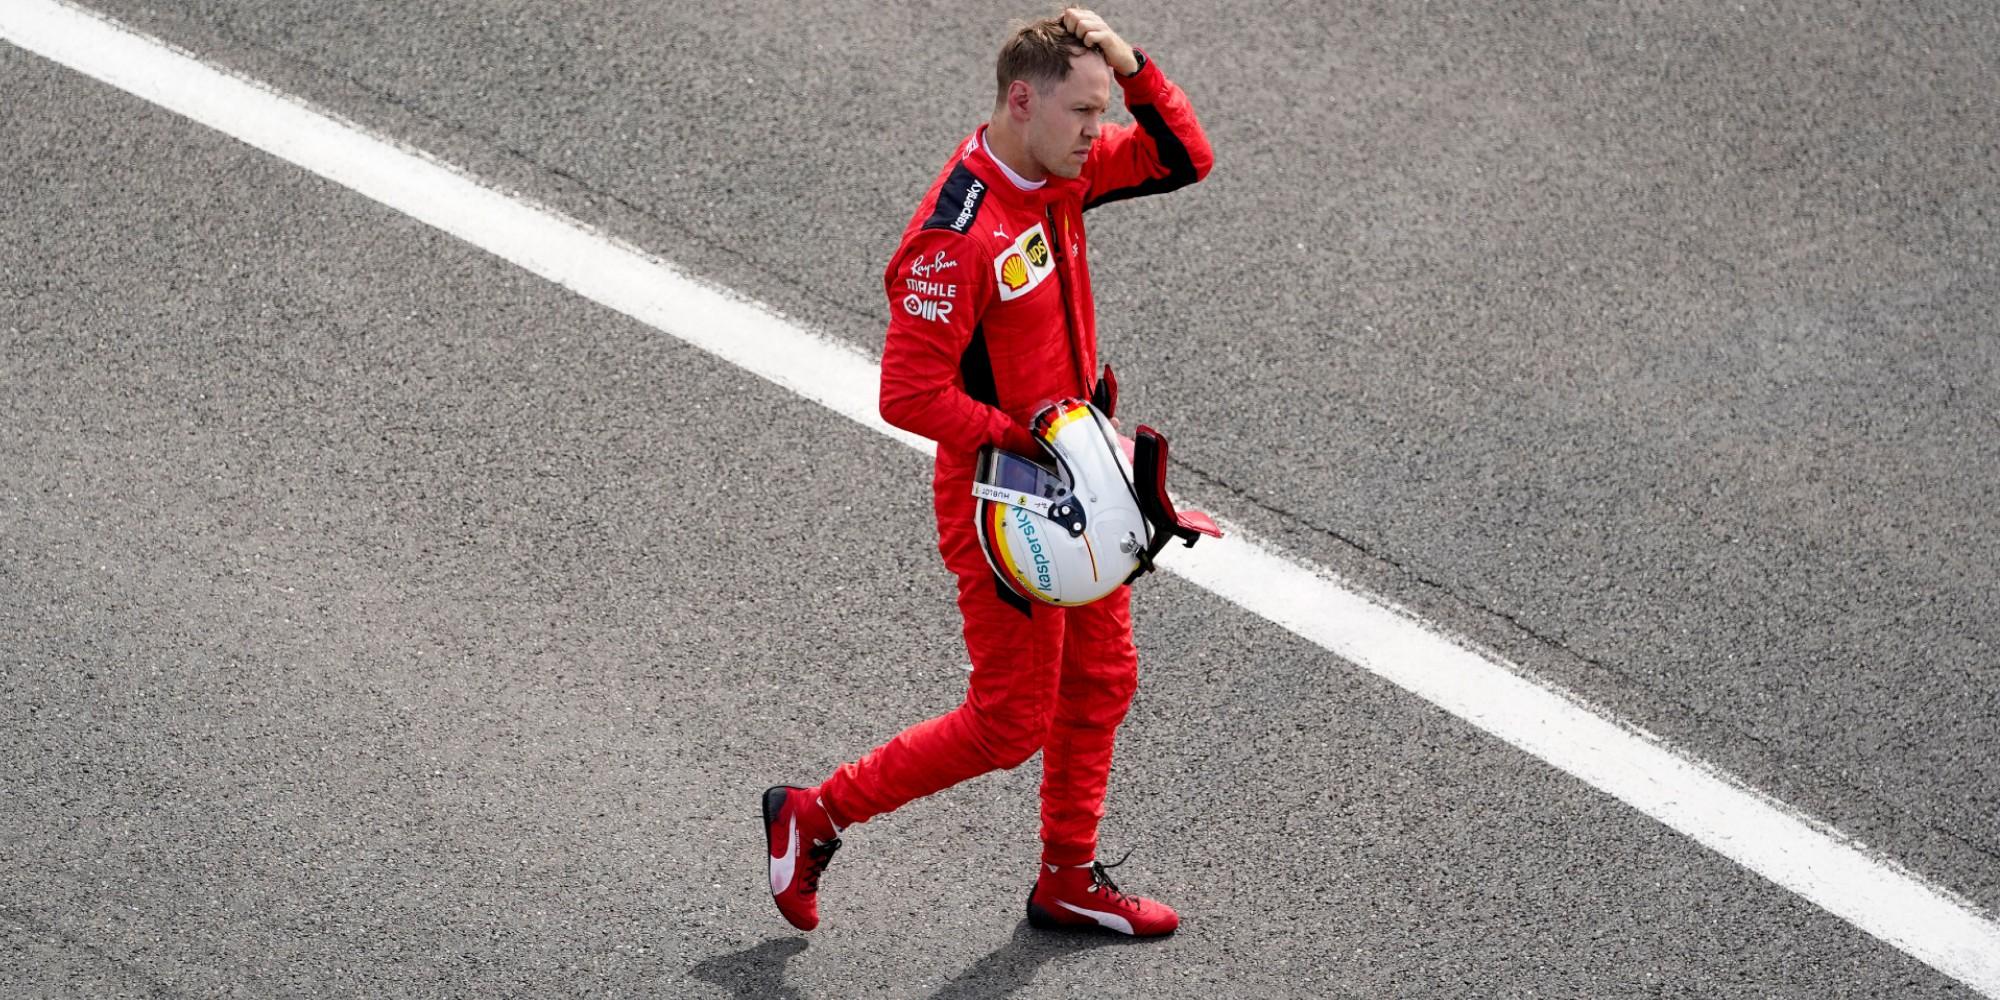 2020 British GP, Sebastian Vettel